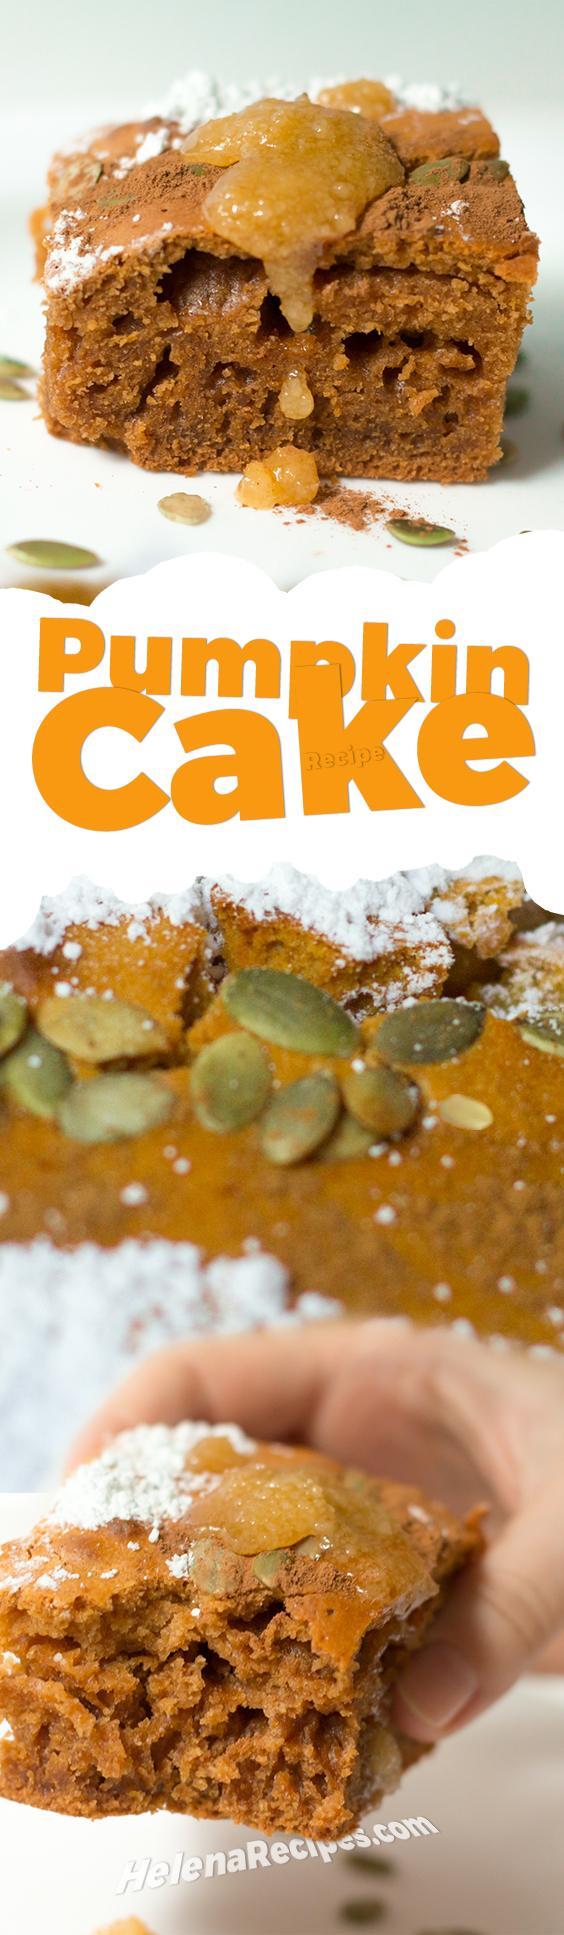 Pumpkin Cake Recipe Pinterest Image